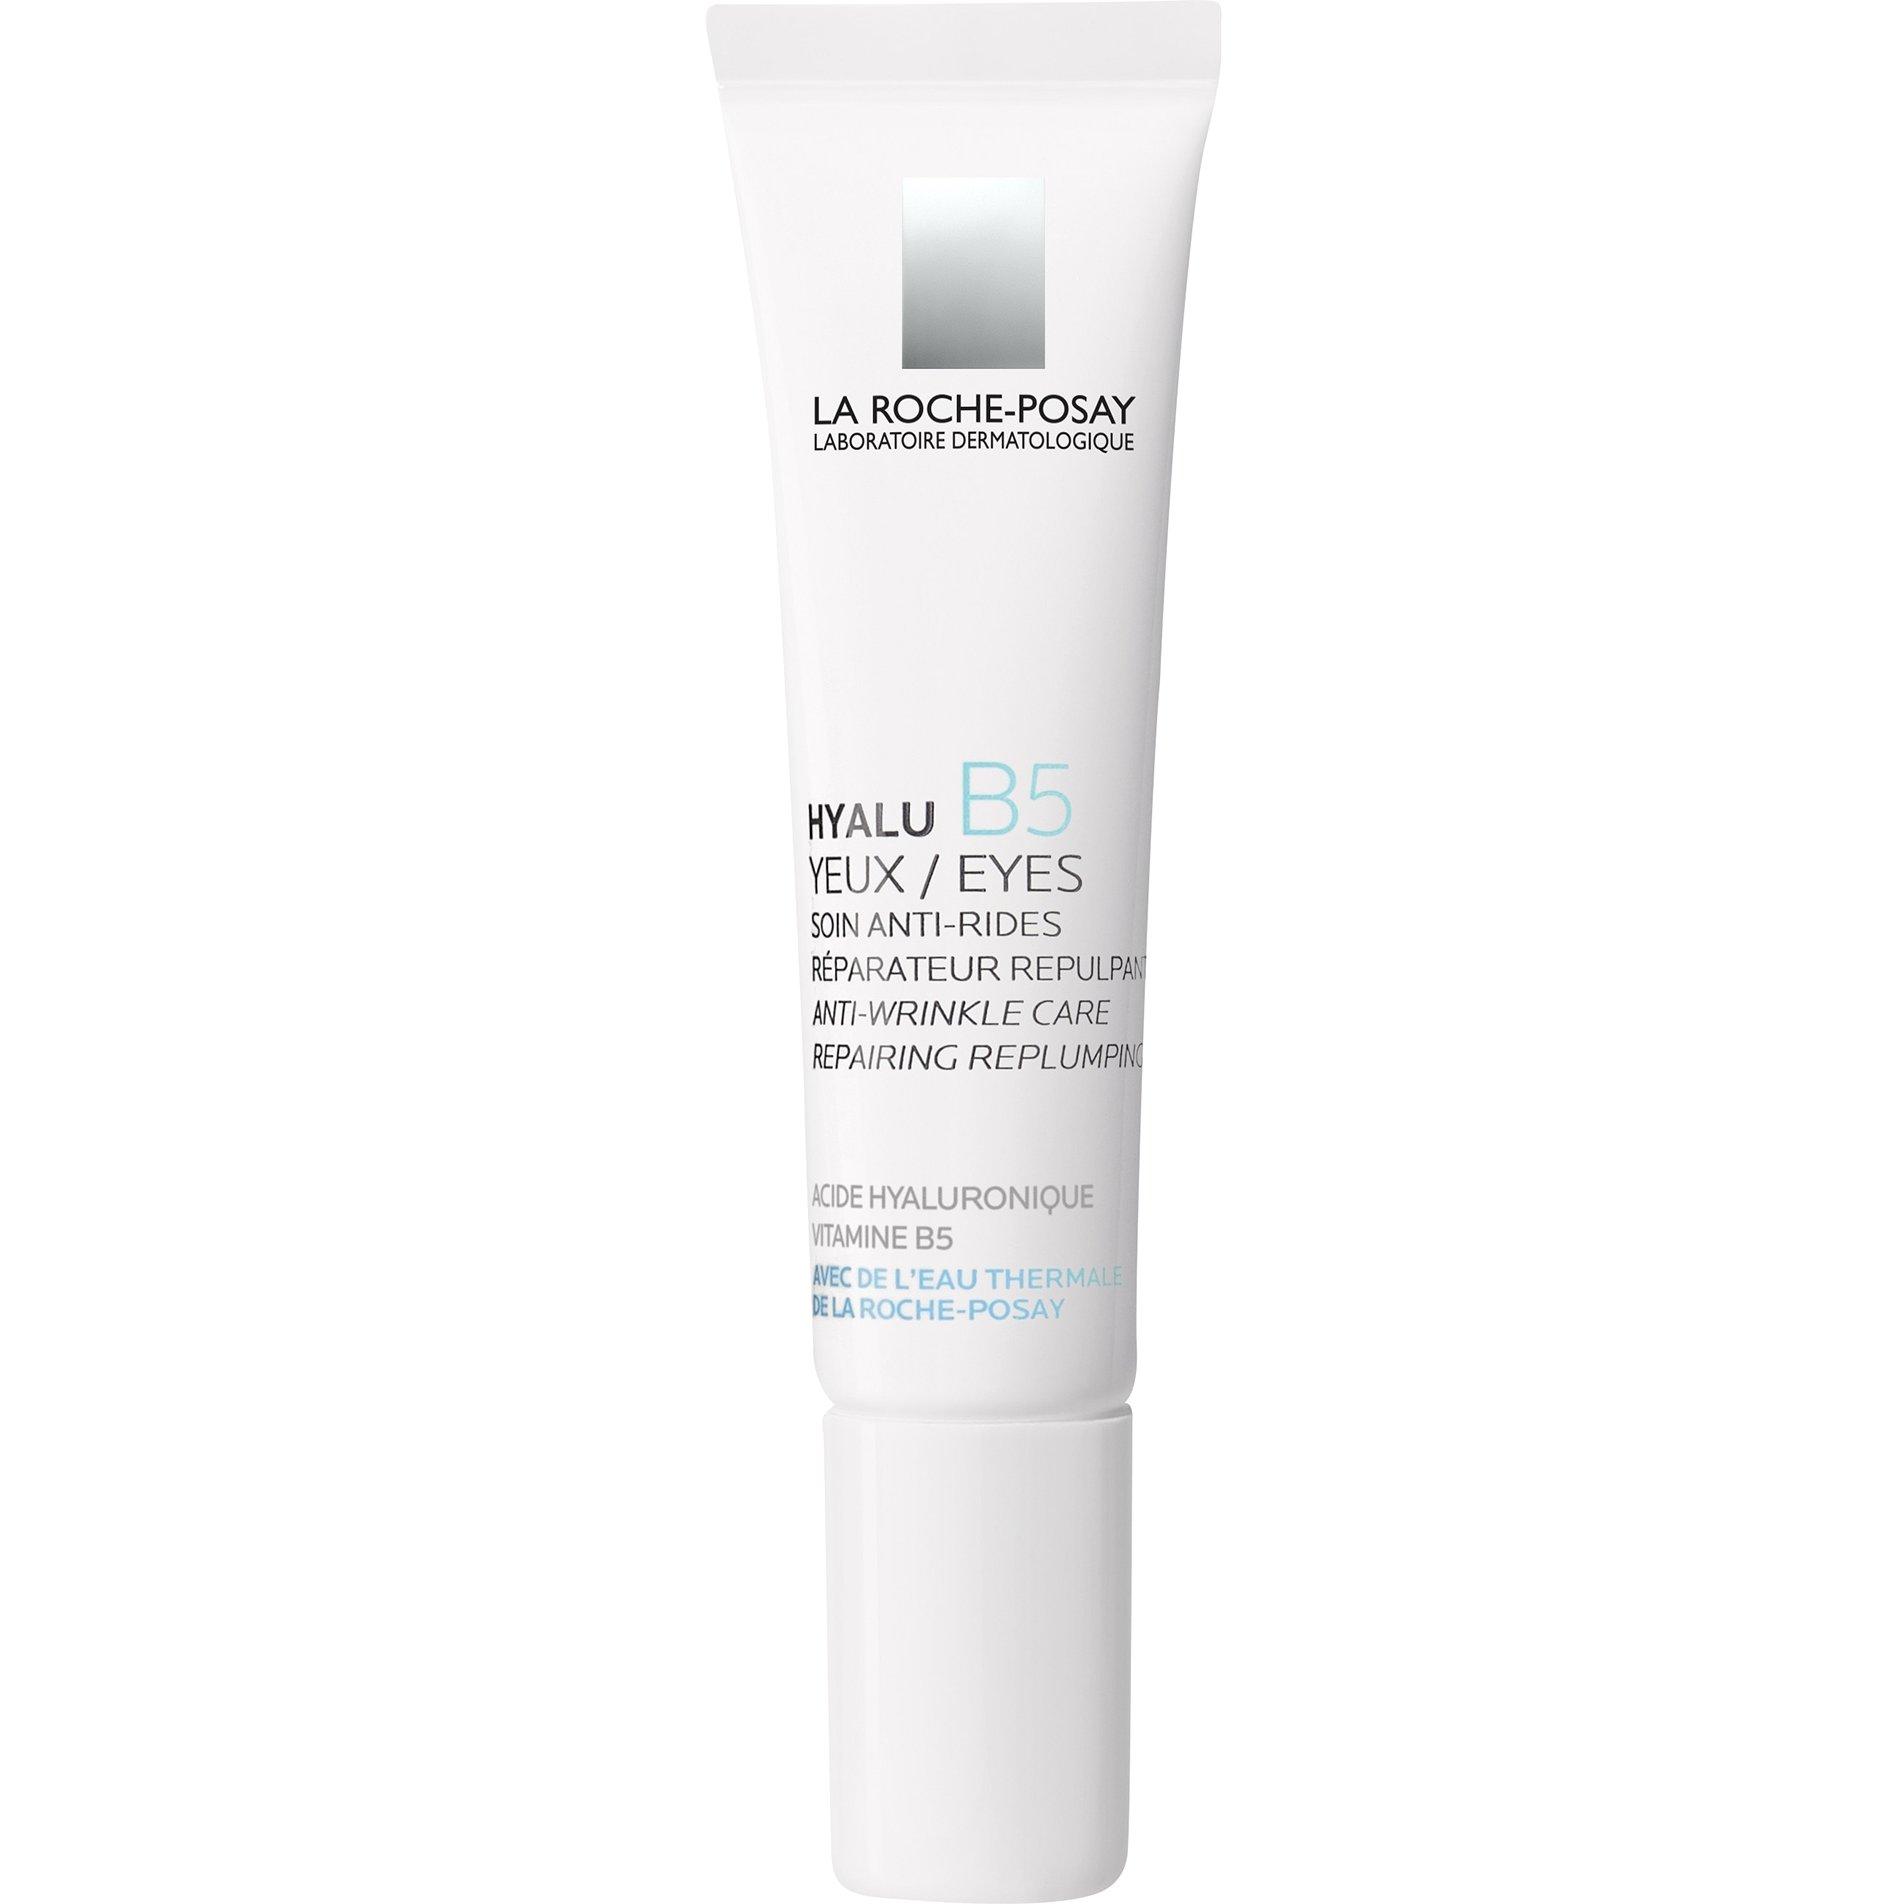 La Roche-Posay Hyalu B5 Anti Wrinkle Eye CreamΑντιρυτιδική Κρέμα Ματιών 15ml